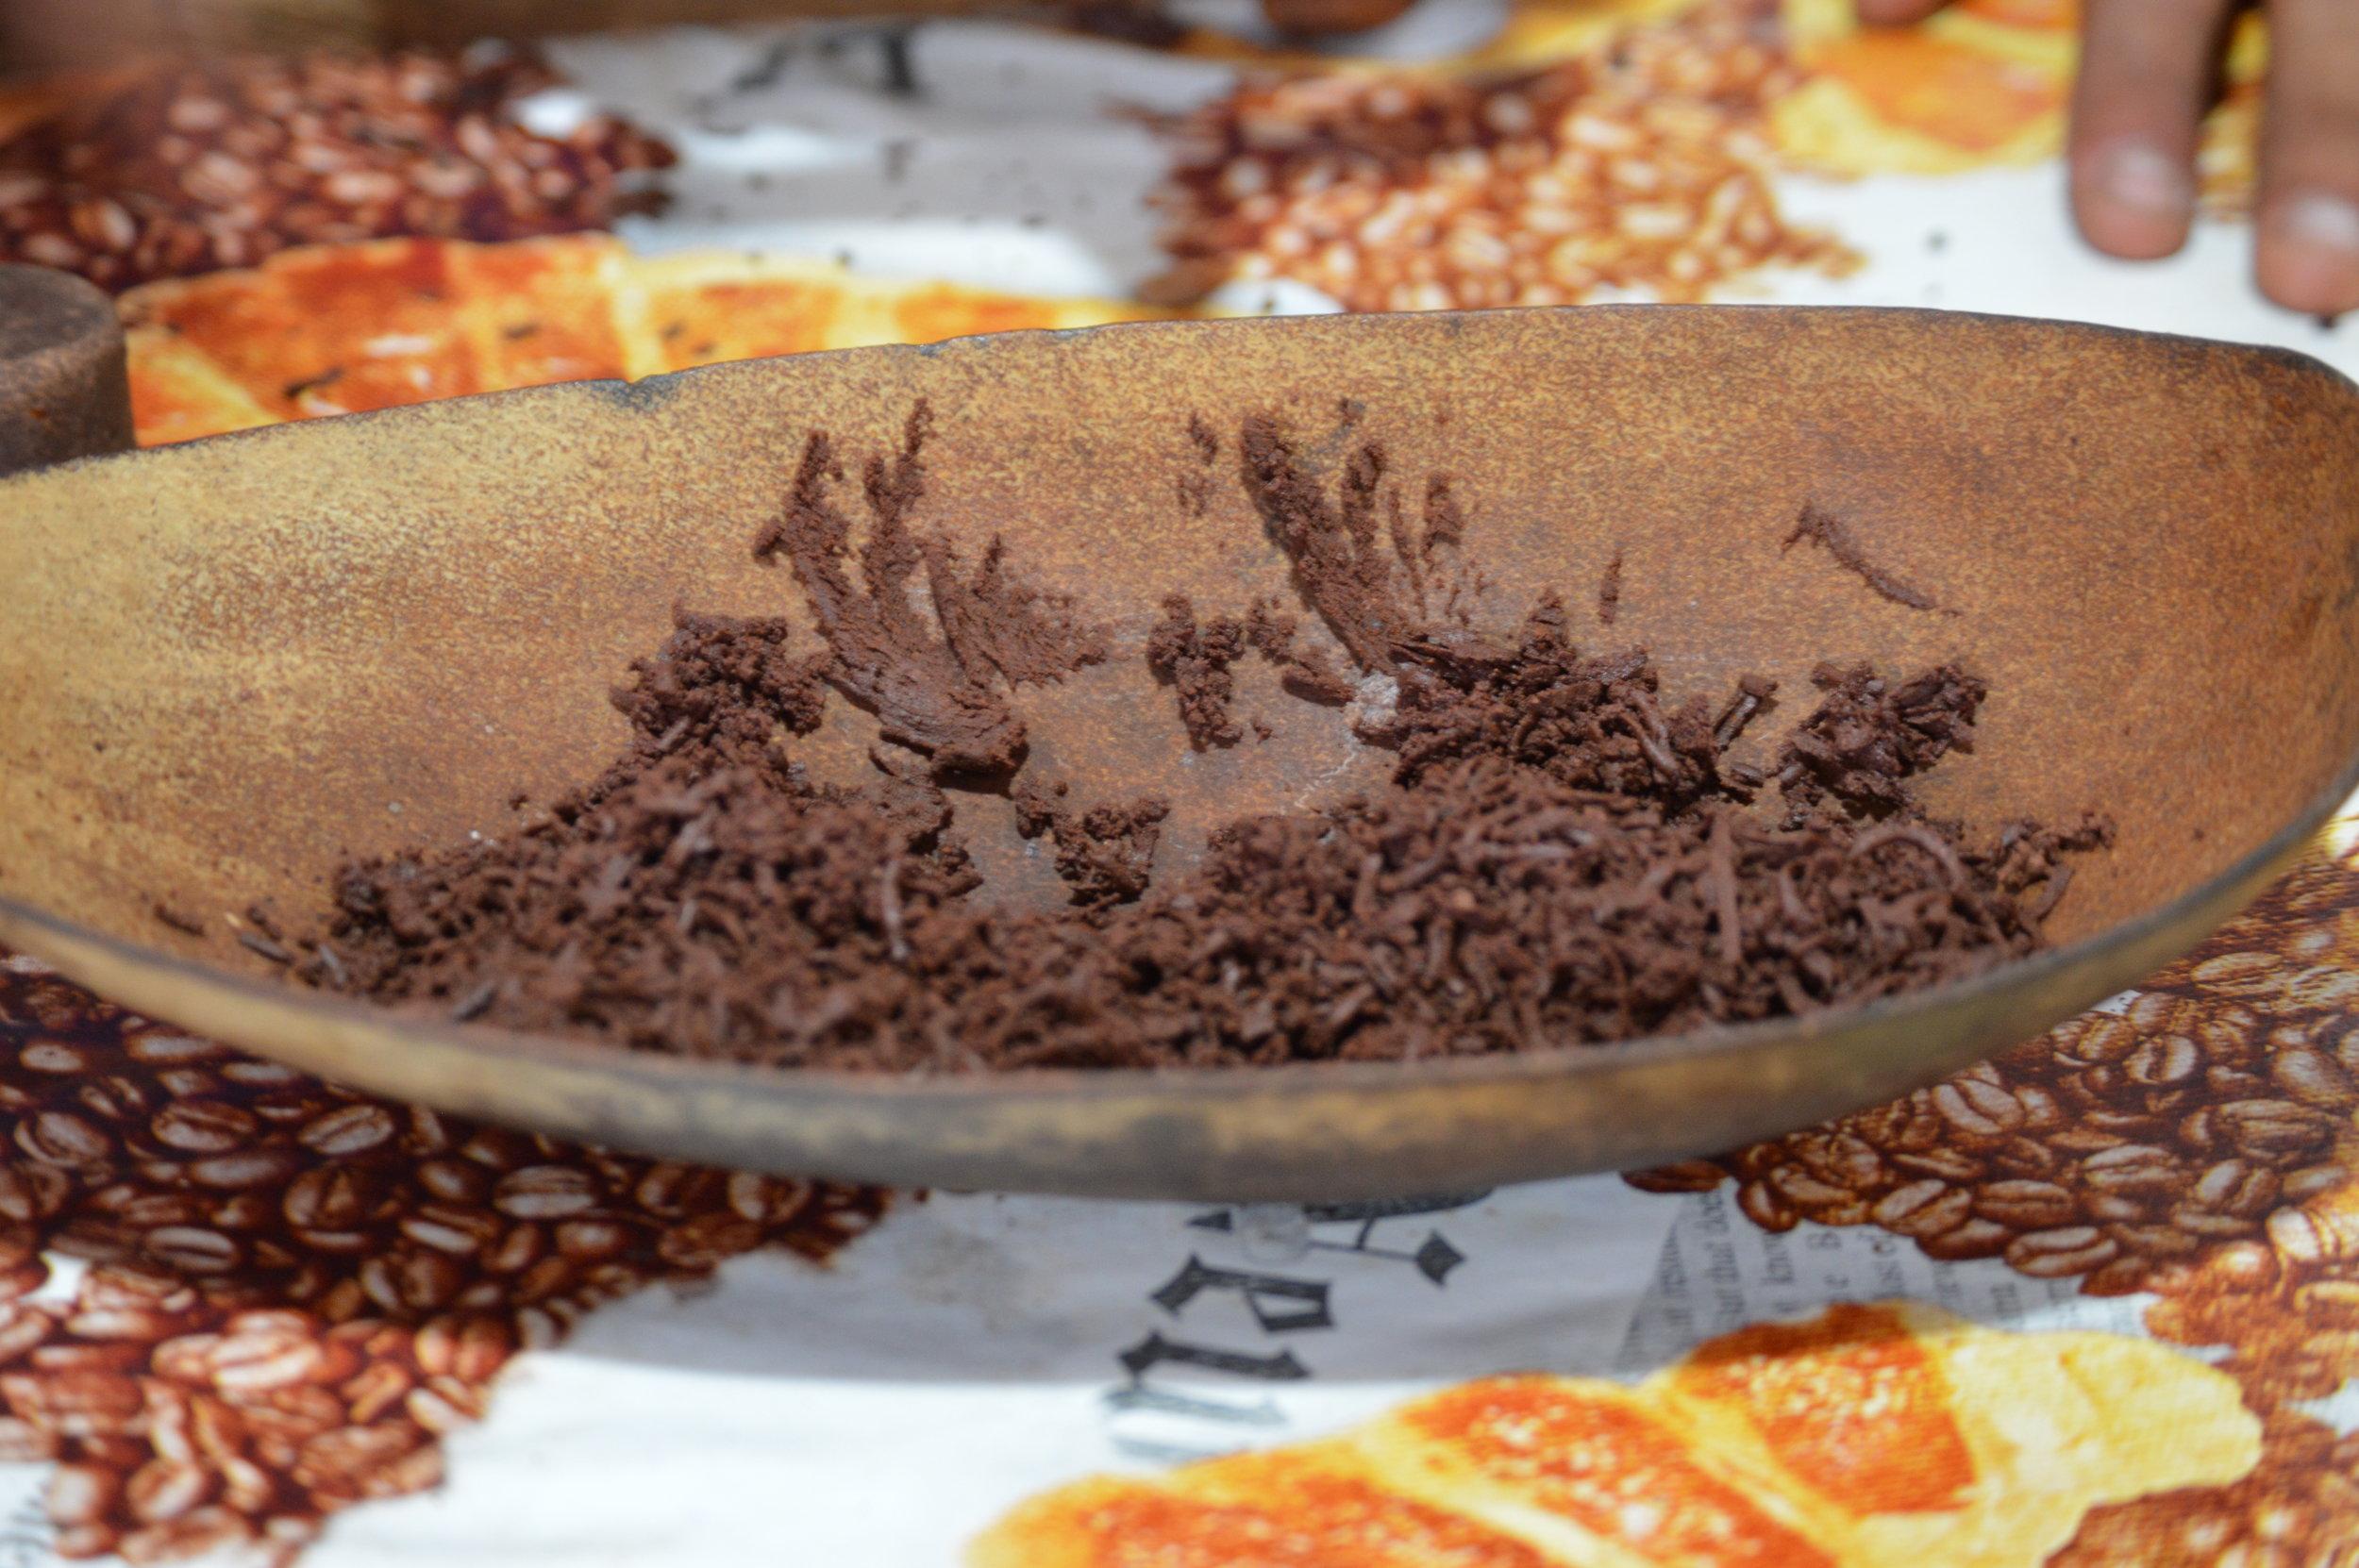 Ground chocolate